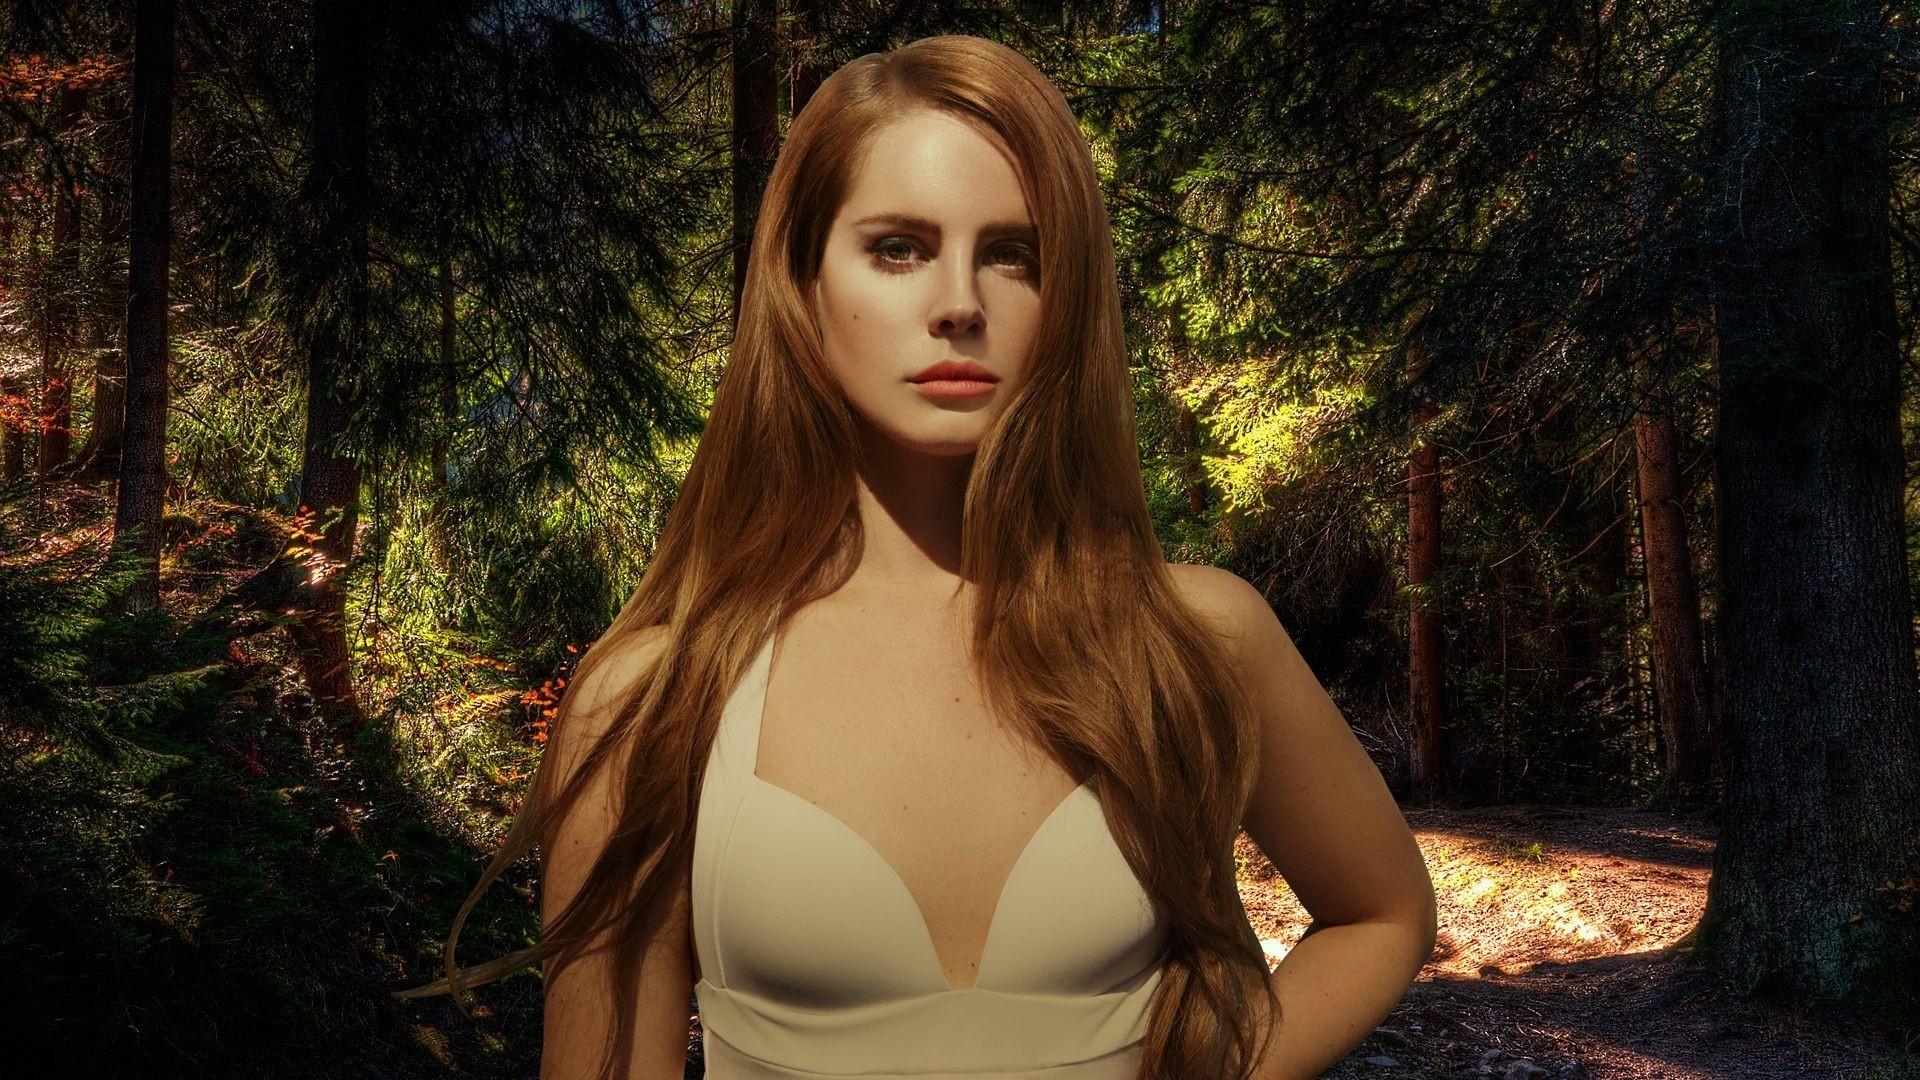 Lana Del Rey Wallpaper image hd